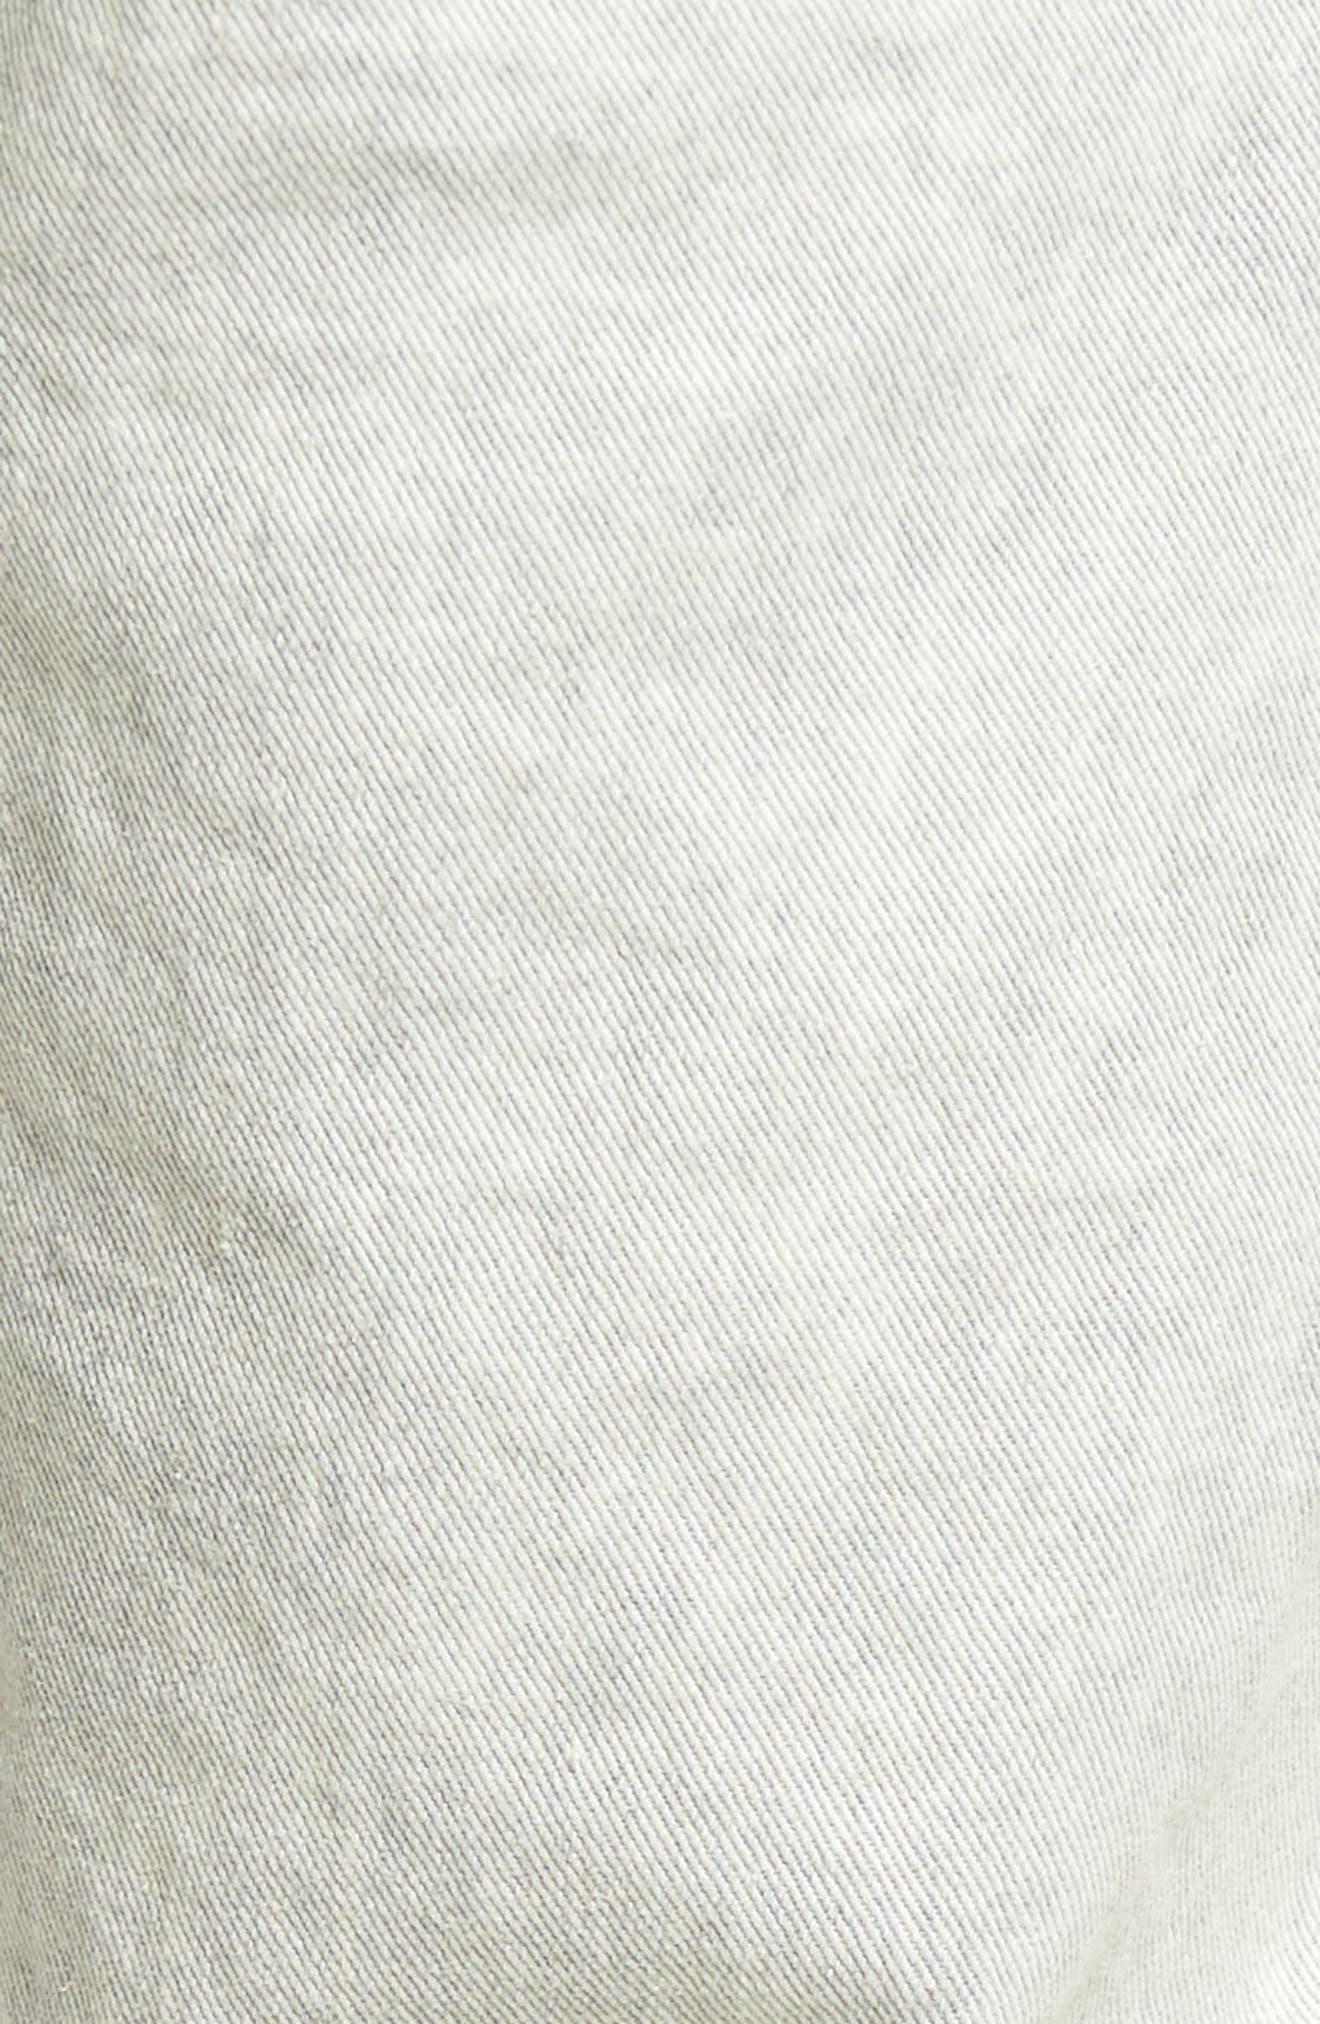 Alternate Image 5  - Levi's® 510™ Skinny Fit Jeans (Gingersnap)